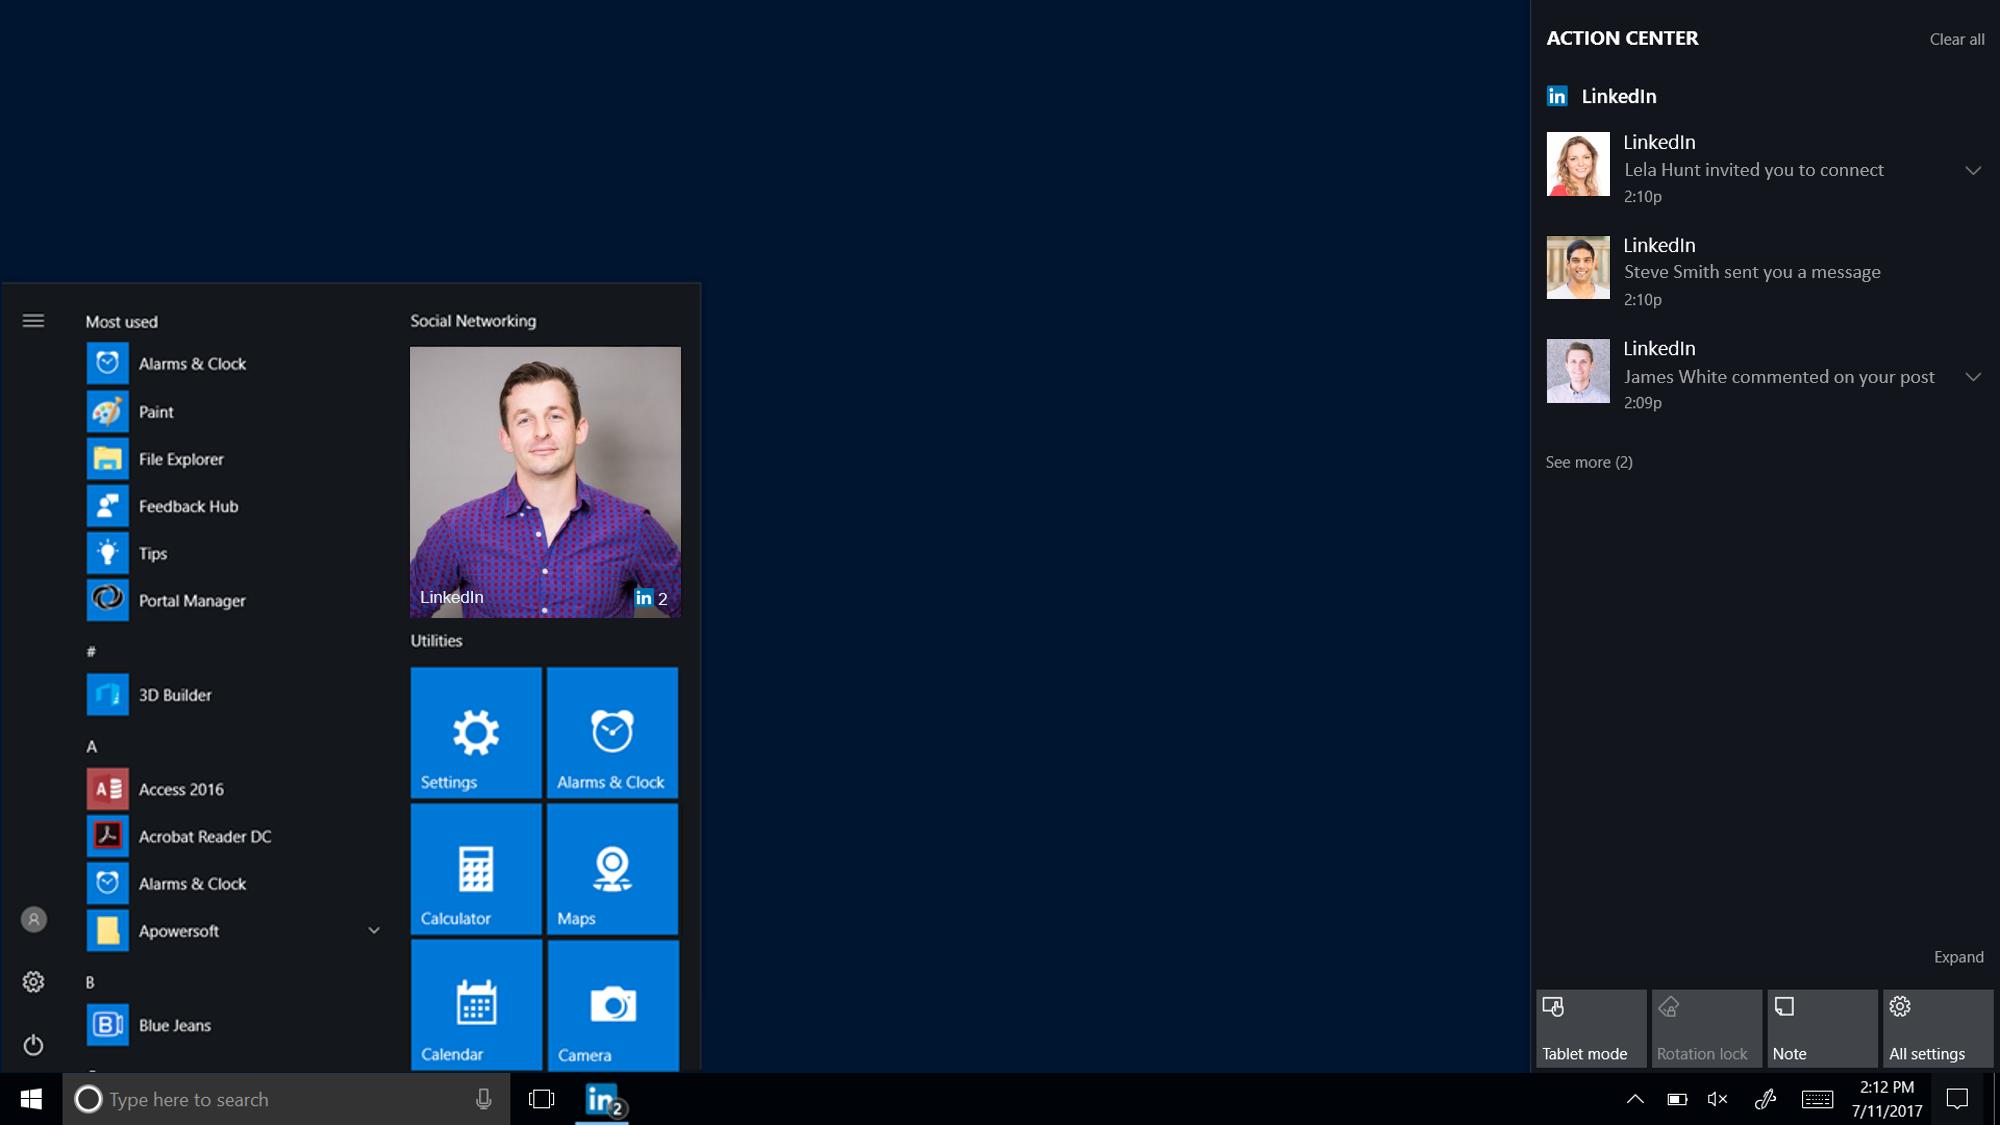 LinkedIn Windows 10 app